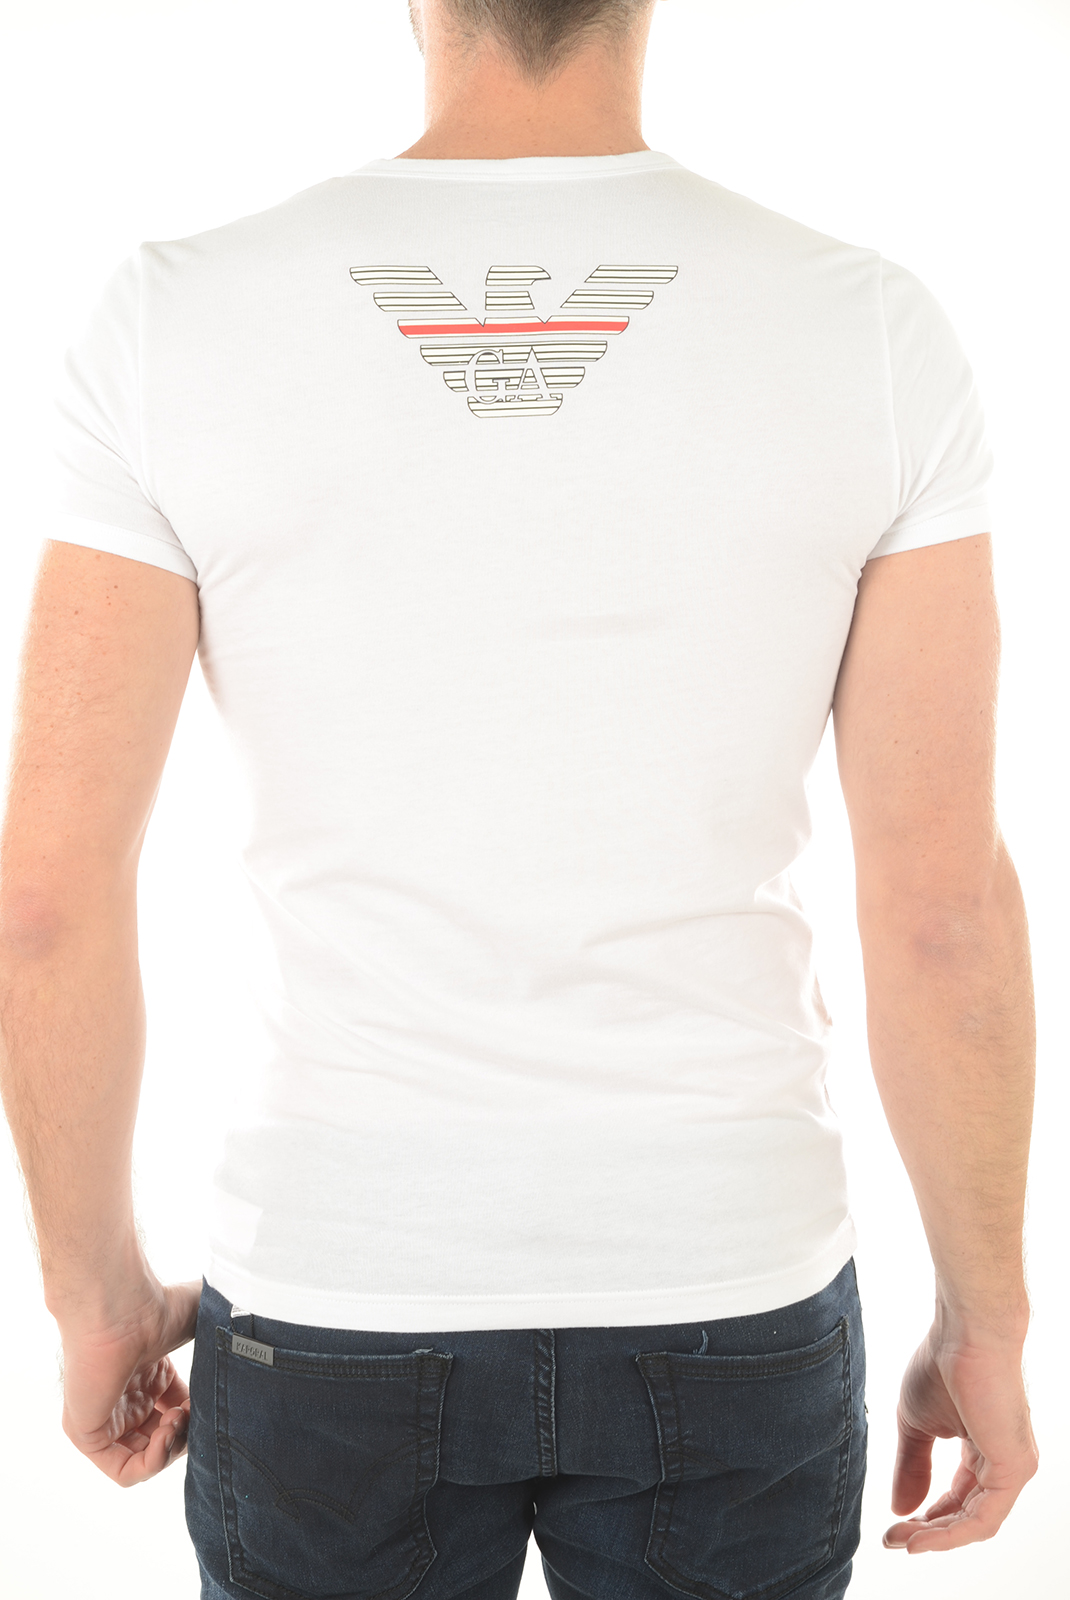 T-S manches courtes  Emporio armani 111035 6P725 10 blanc